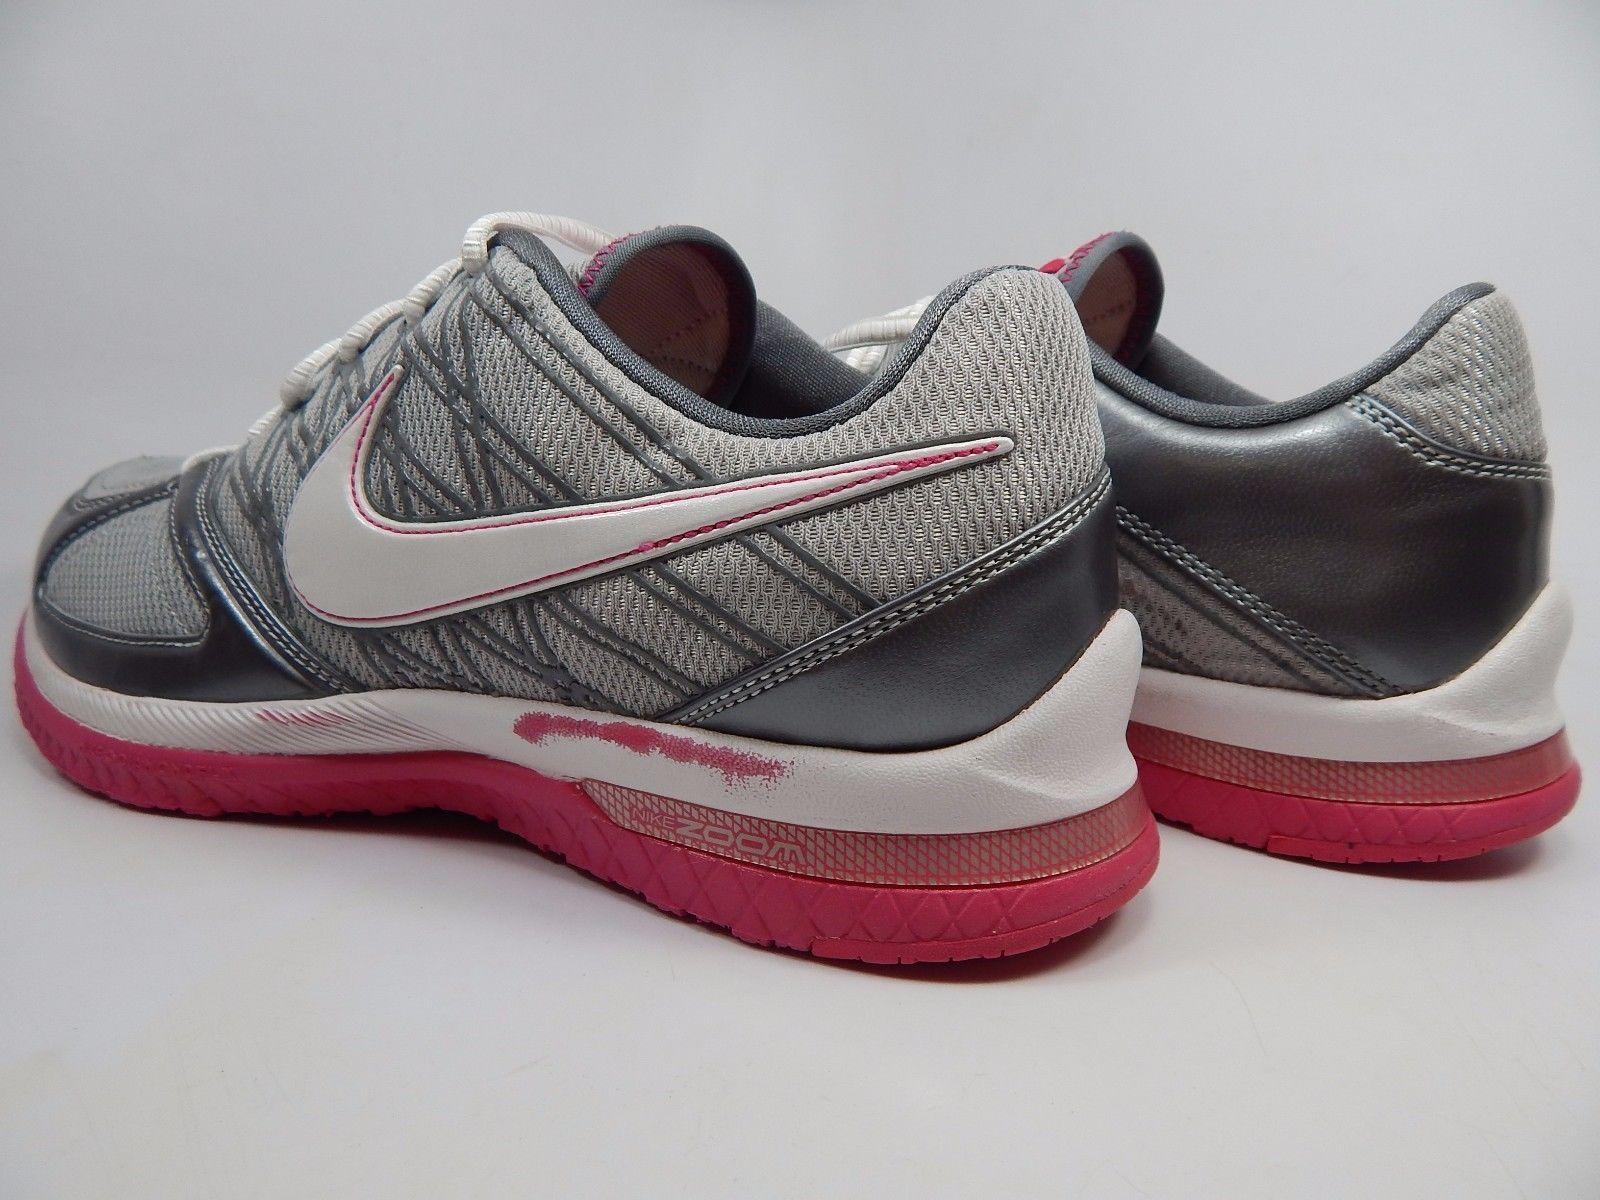 Nike Zoom Quick Sister+ Women's Shoes Size US 9.5 M (B) EU 41 Silver 344952-012